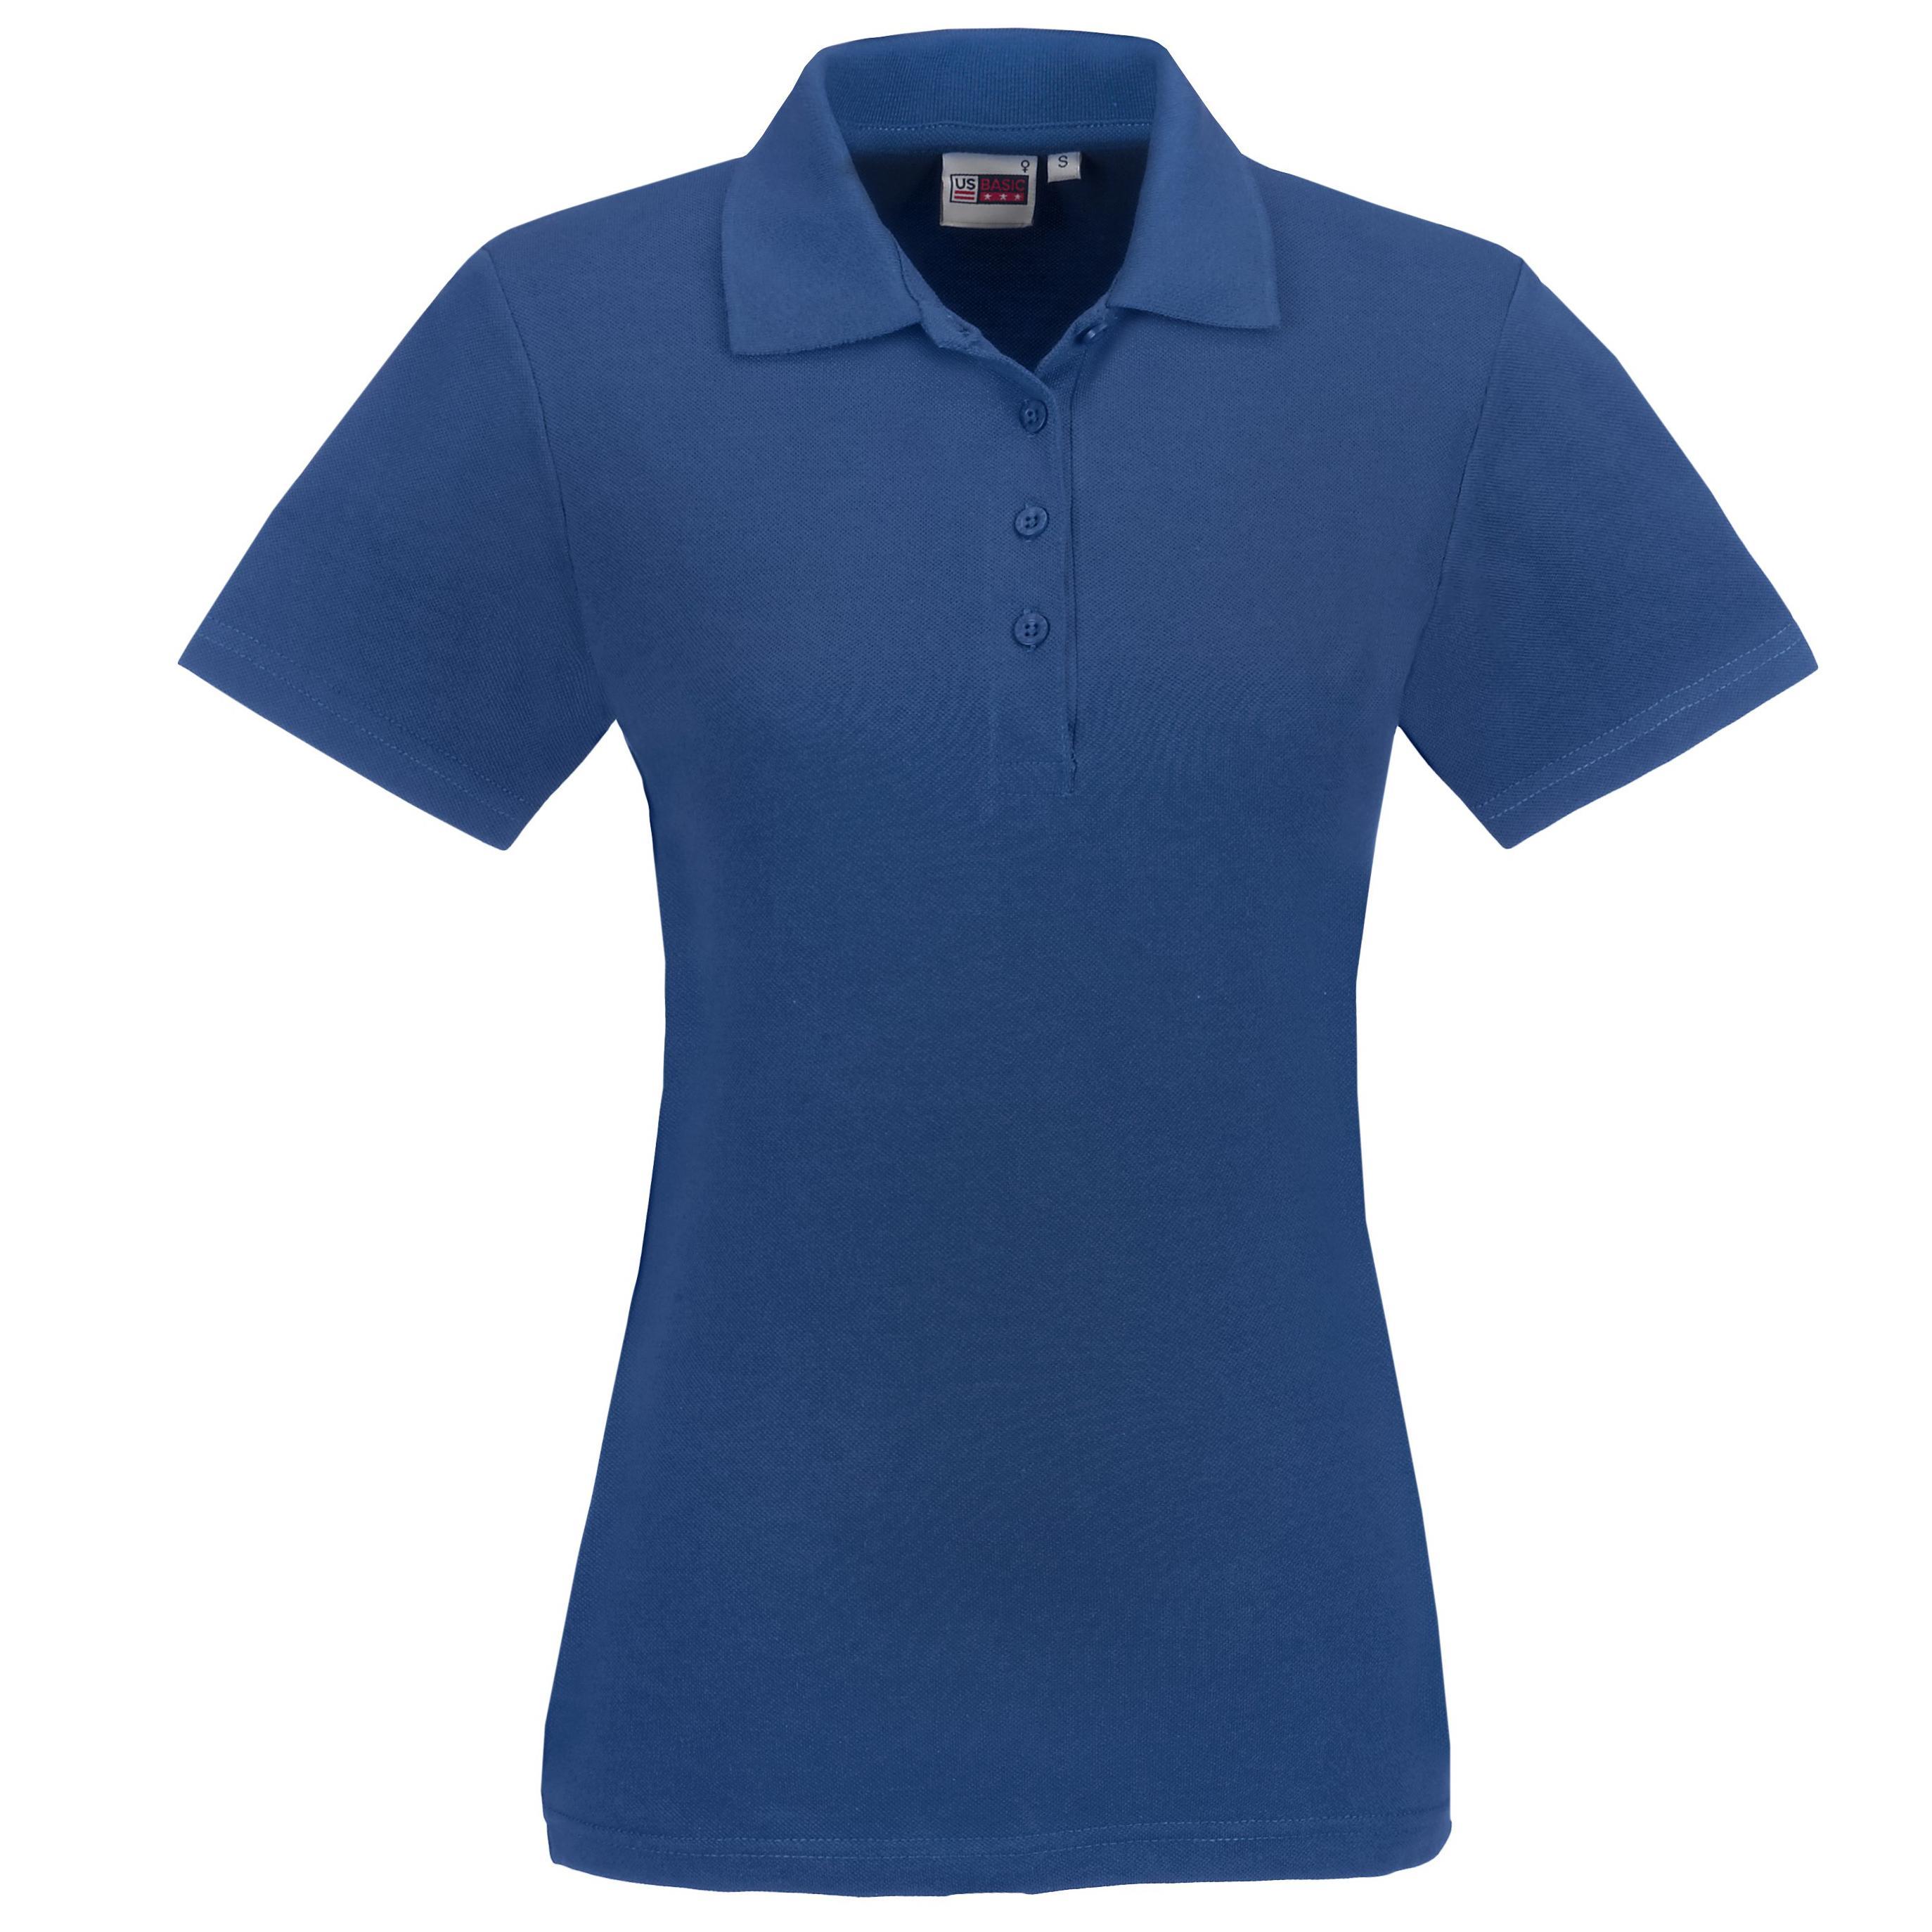 Ladies Elemental Golf Shirt - Royal Blue Only